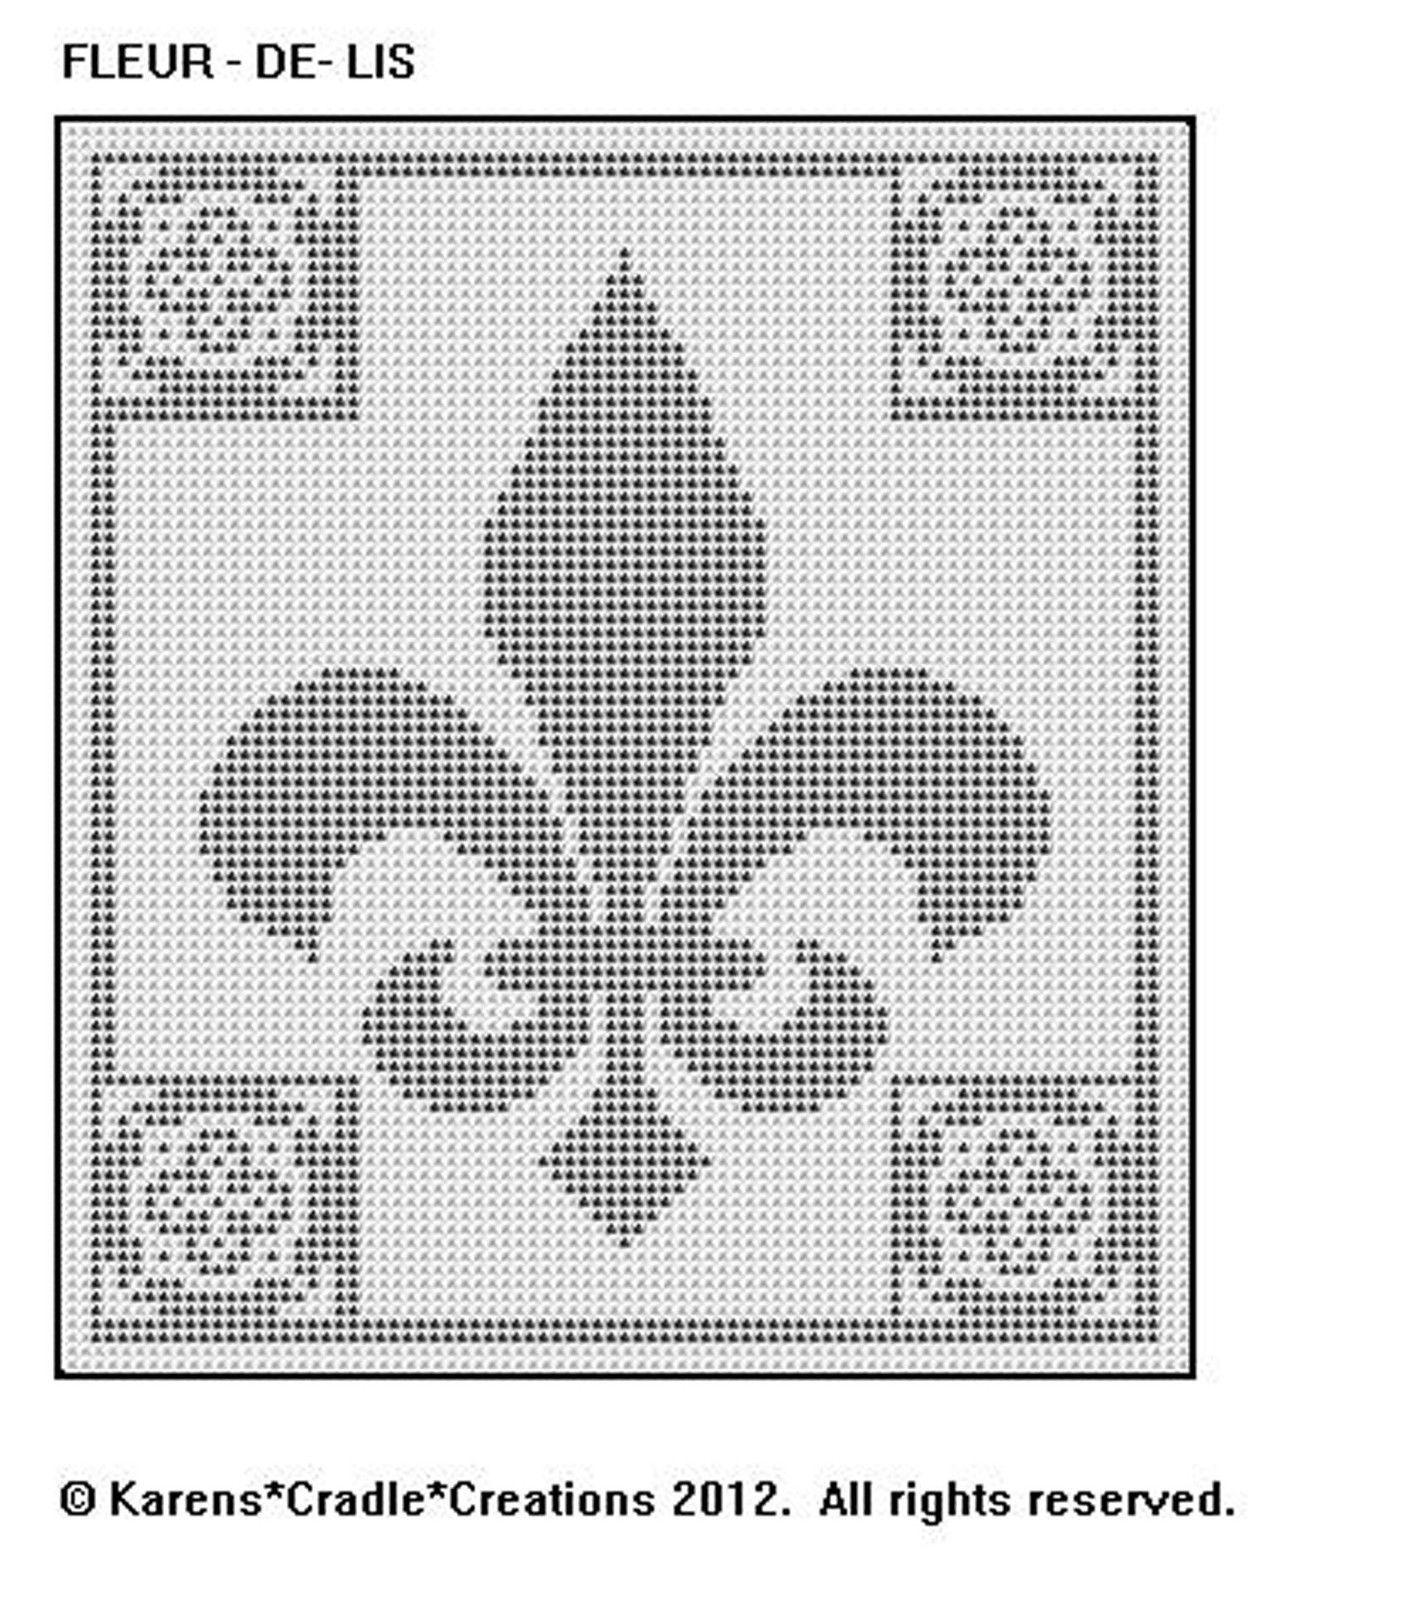 FLEUR - DE - LIS Filet Crochet Pattern   Häkeln vorlagen, Vorlagen ...